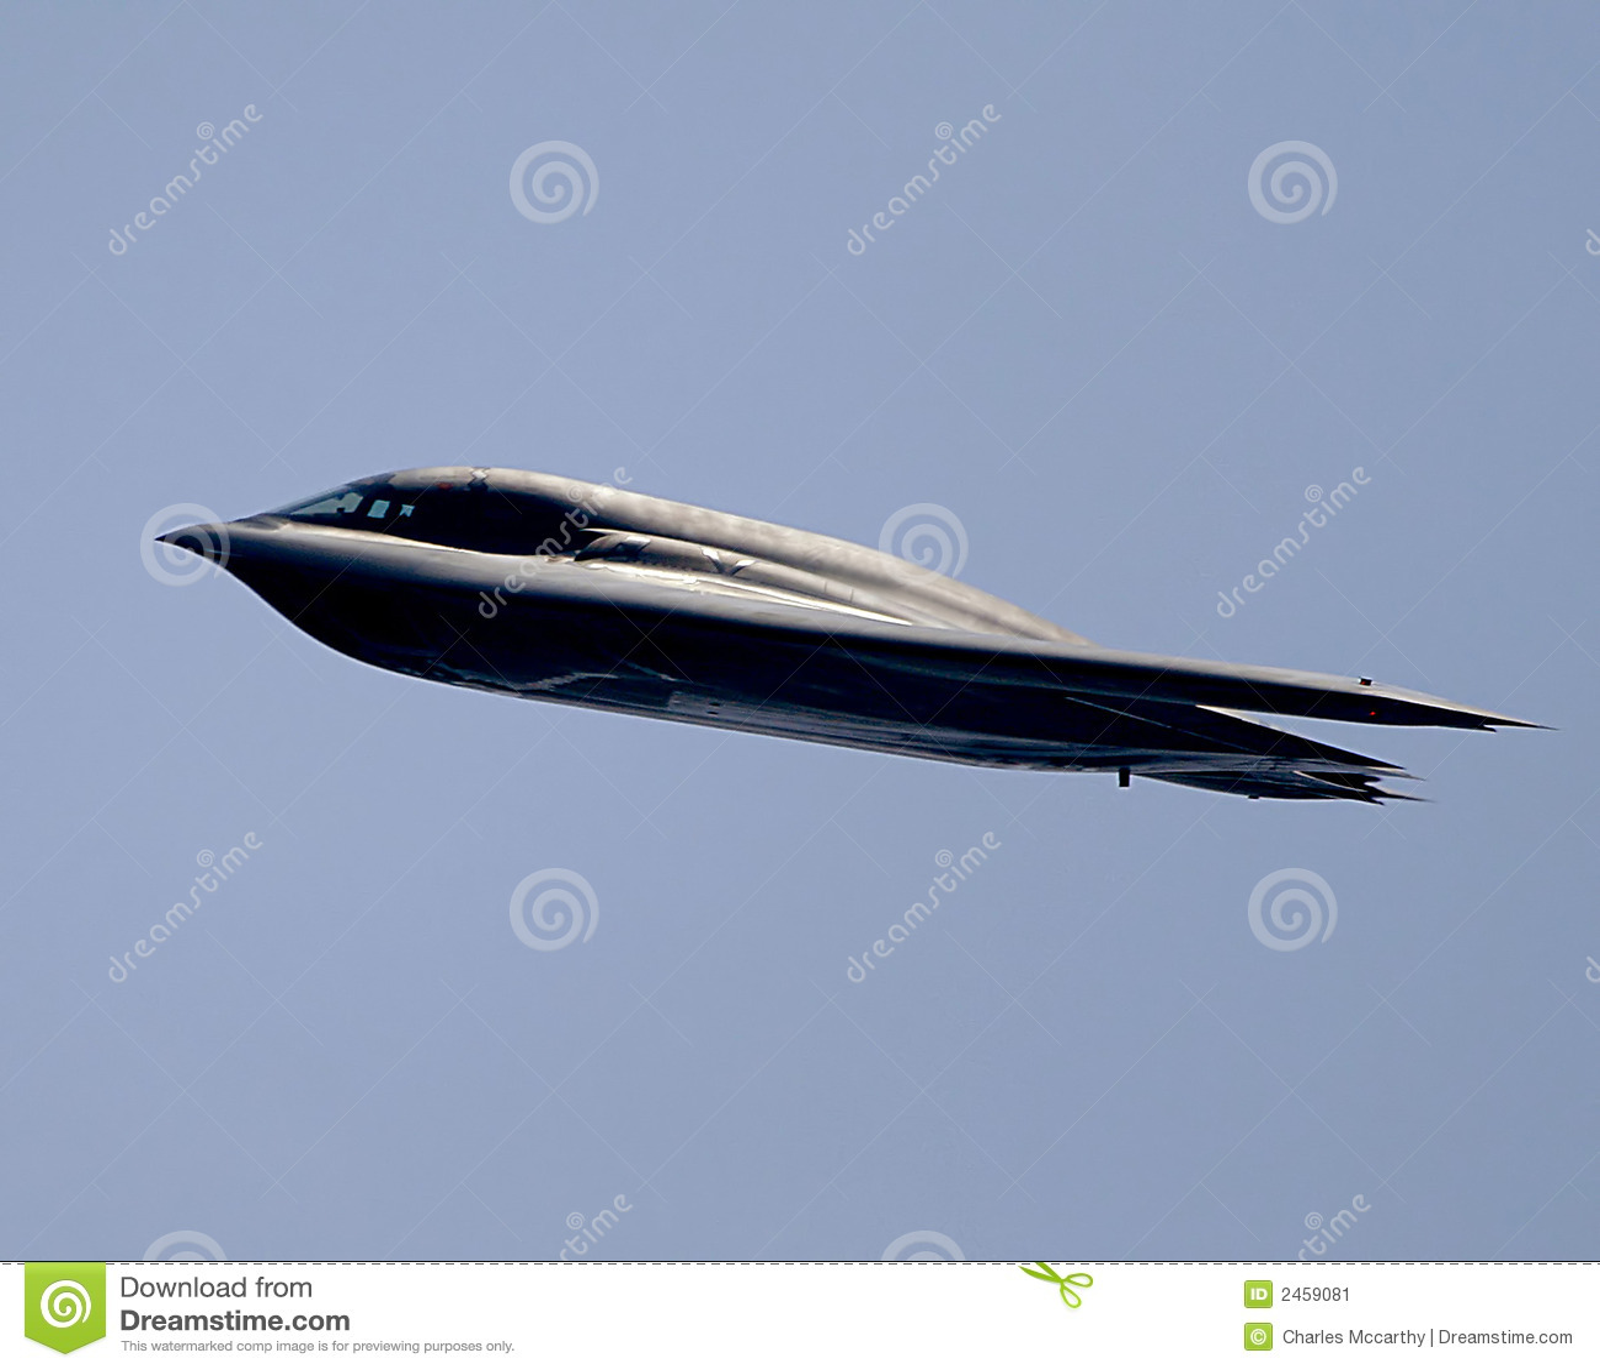 B2 stealth bomber in flight